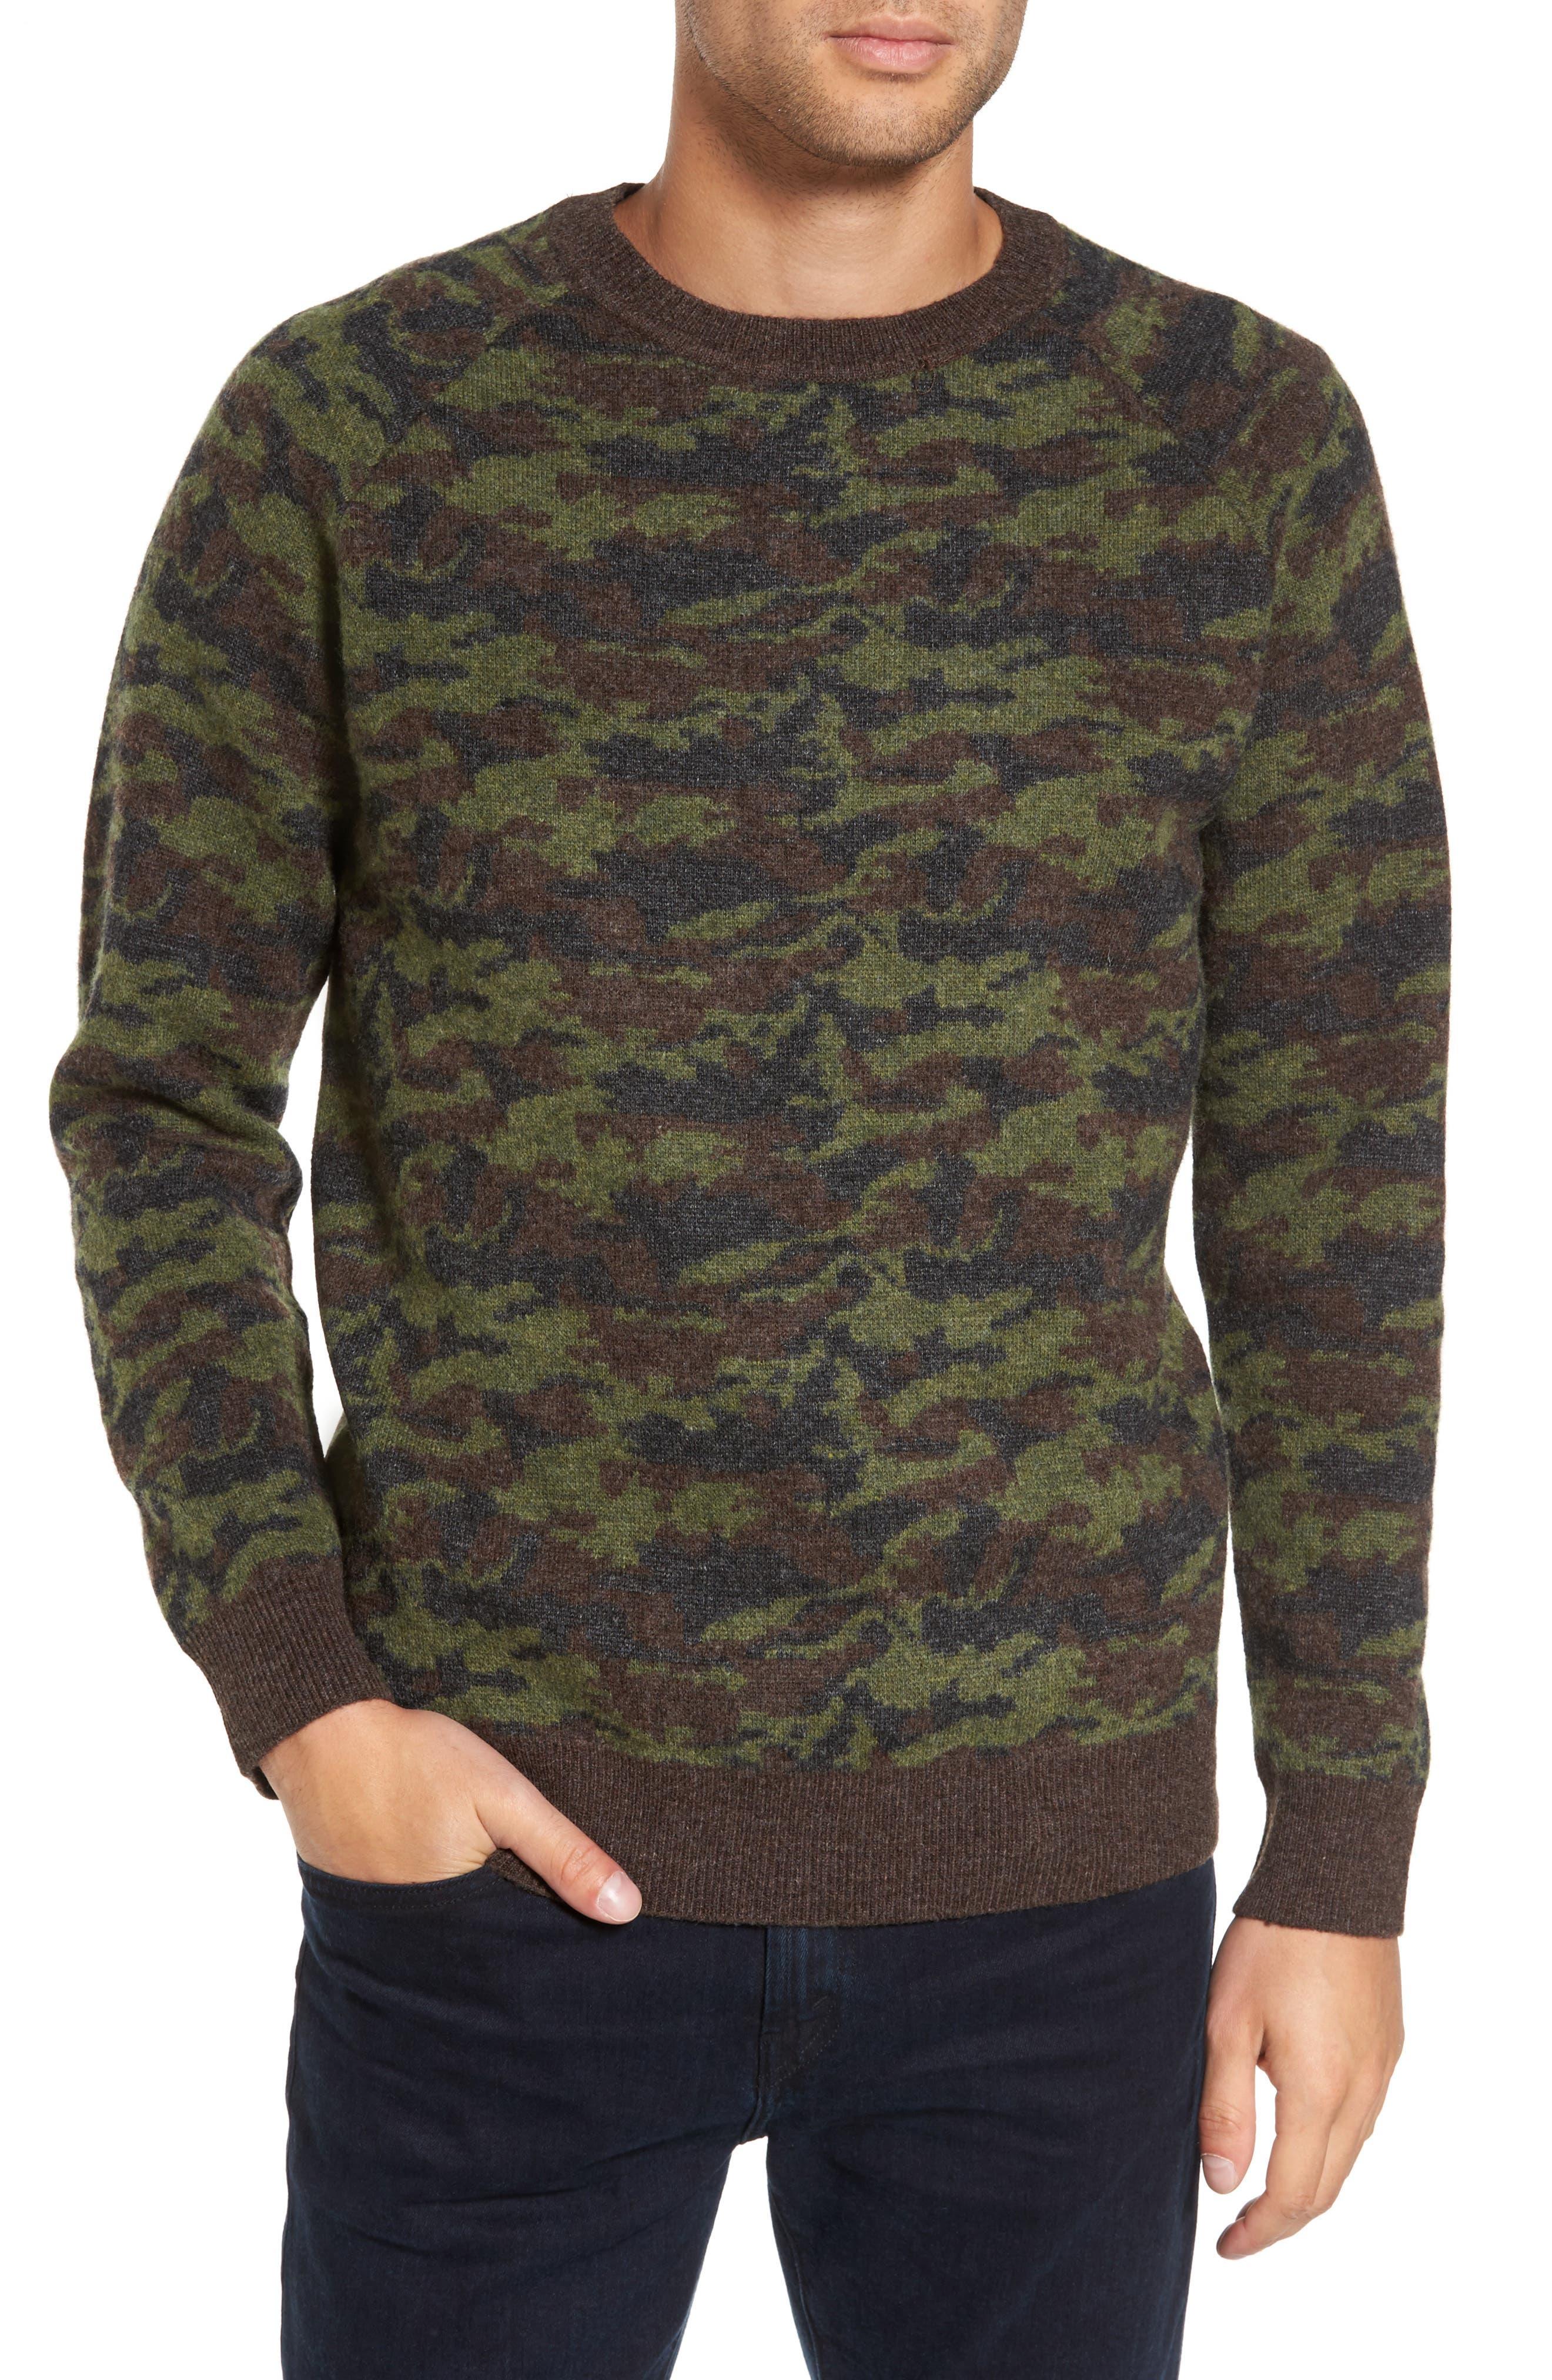 Wool Camo Sweater,                             Main thumbnail 1, color,                             Green Camo